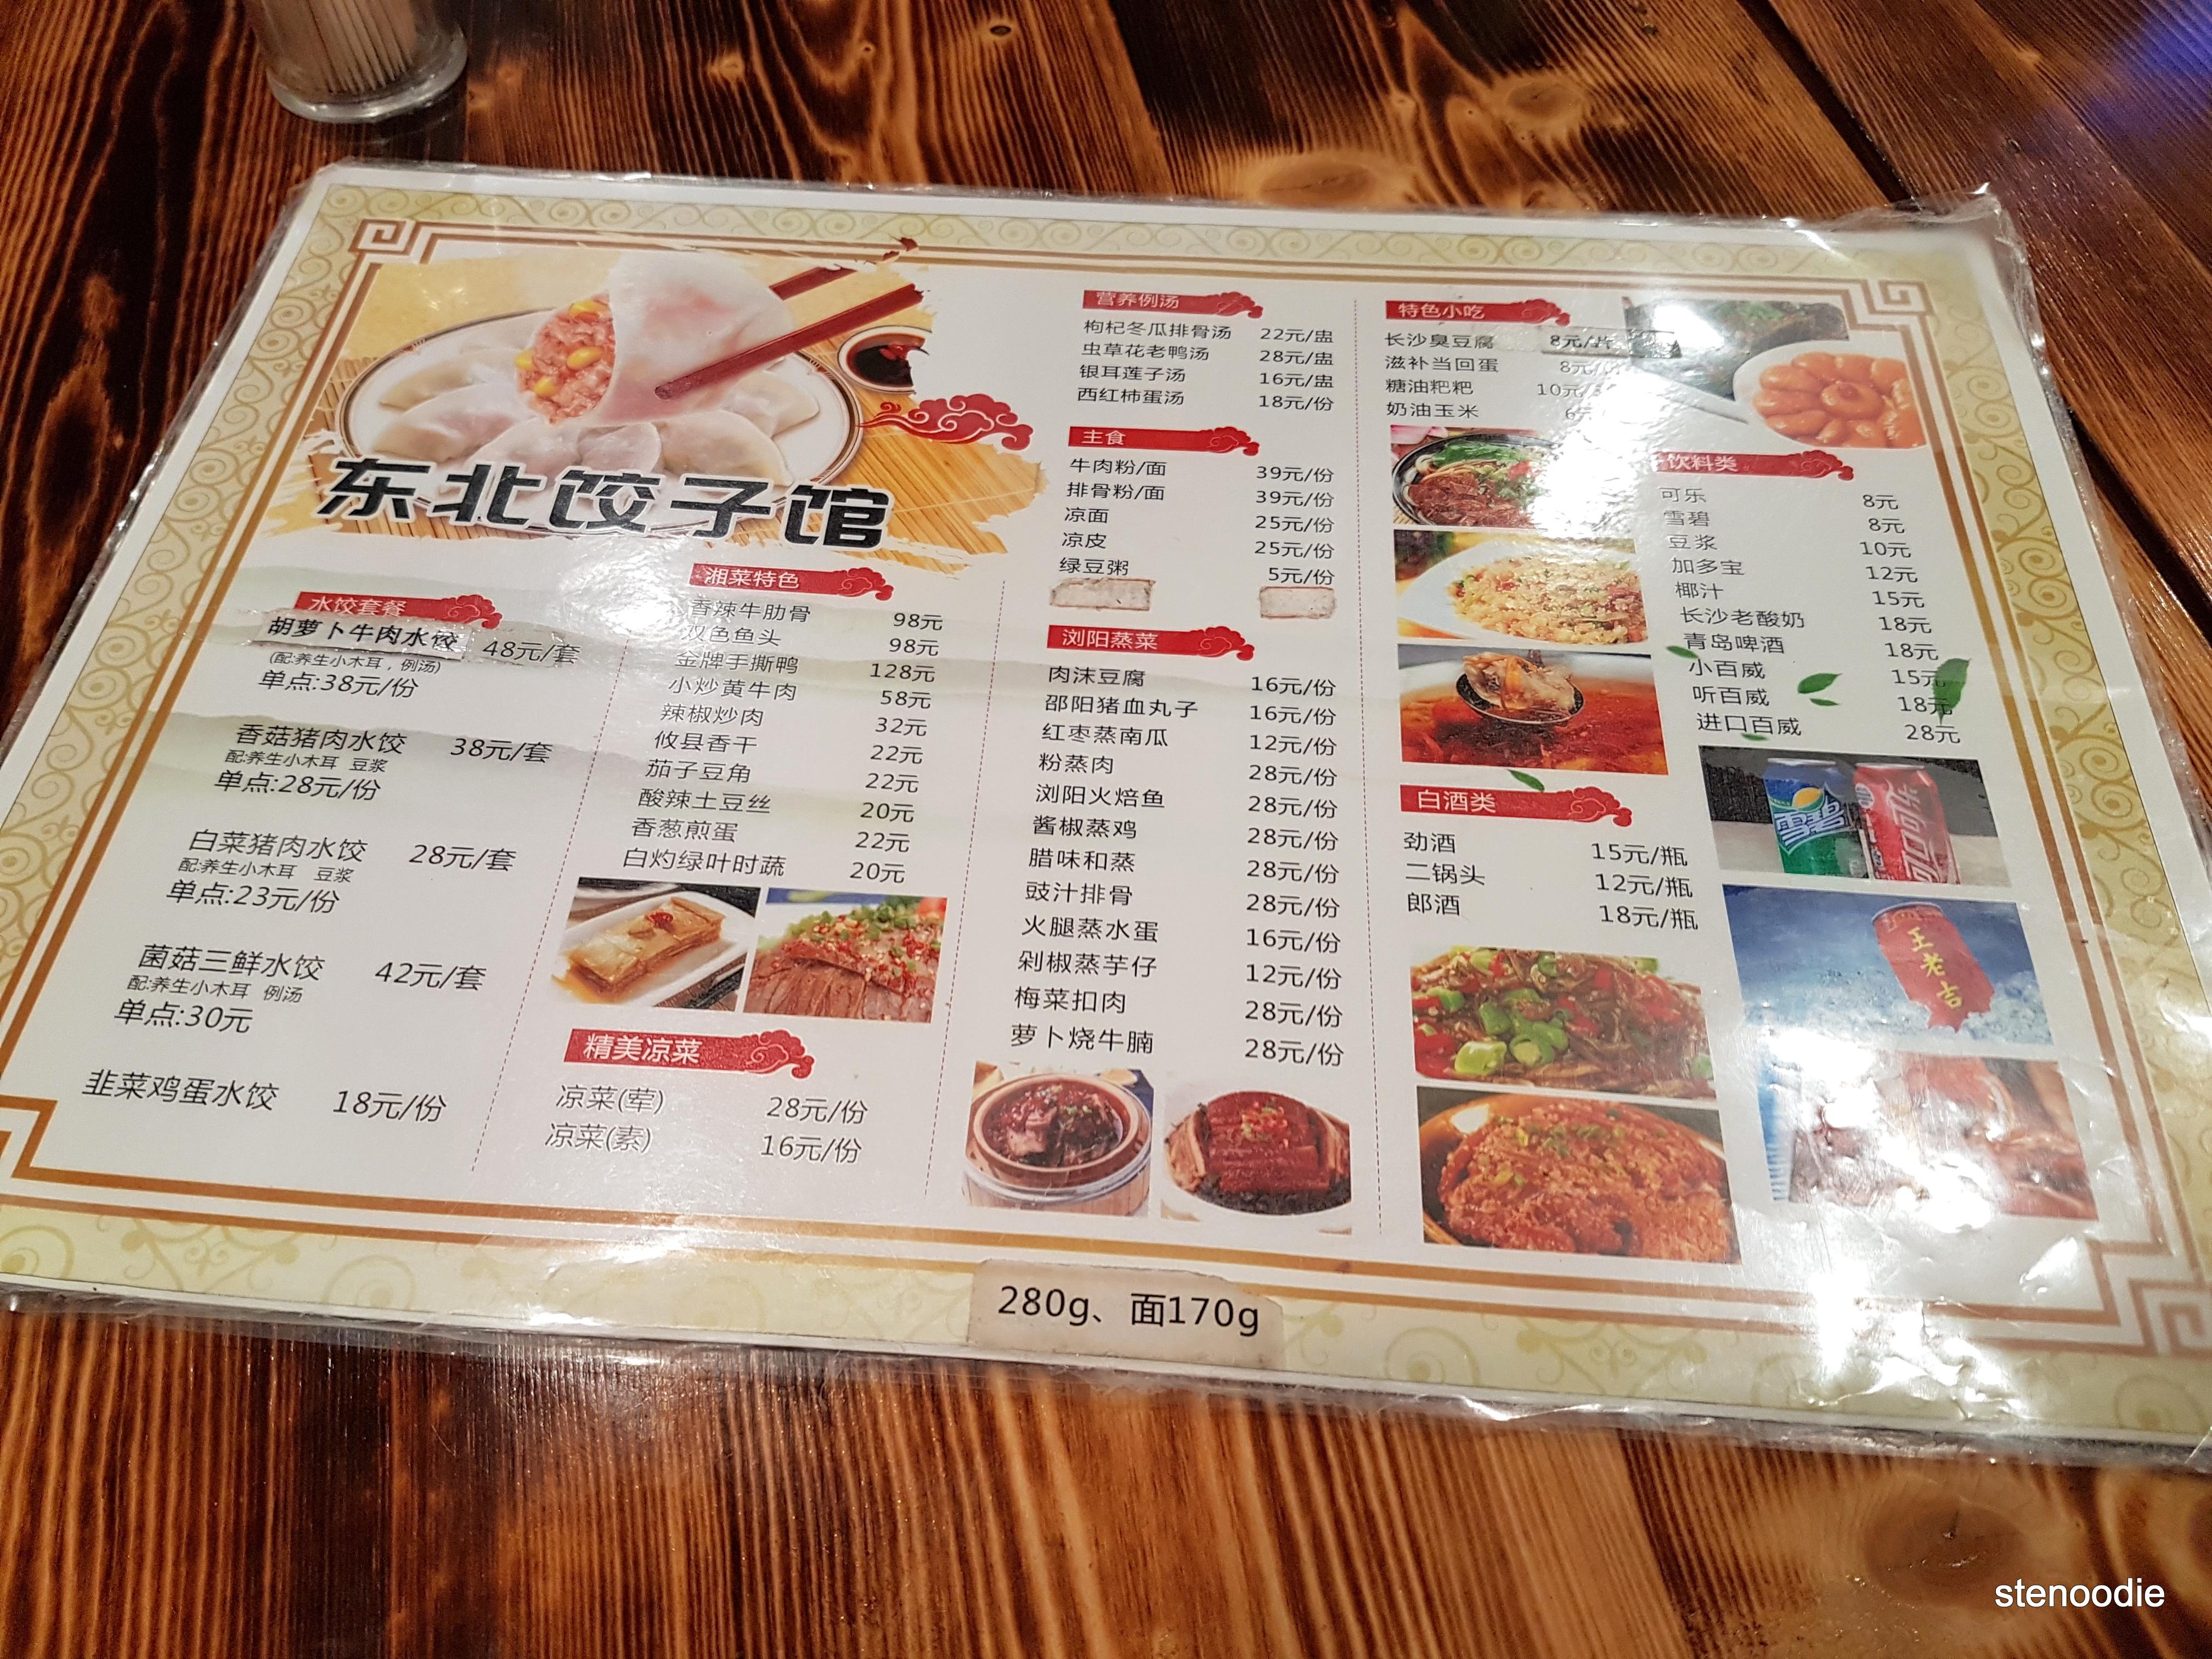 Dumpling restaurant's menu